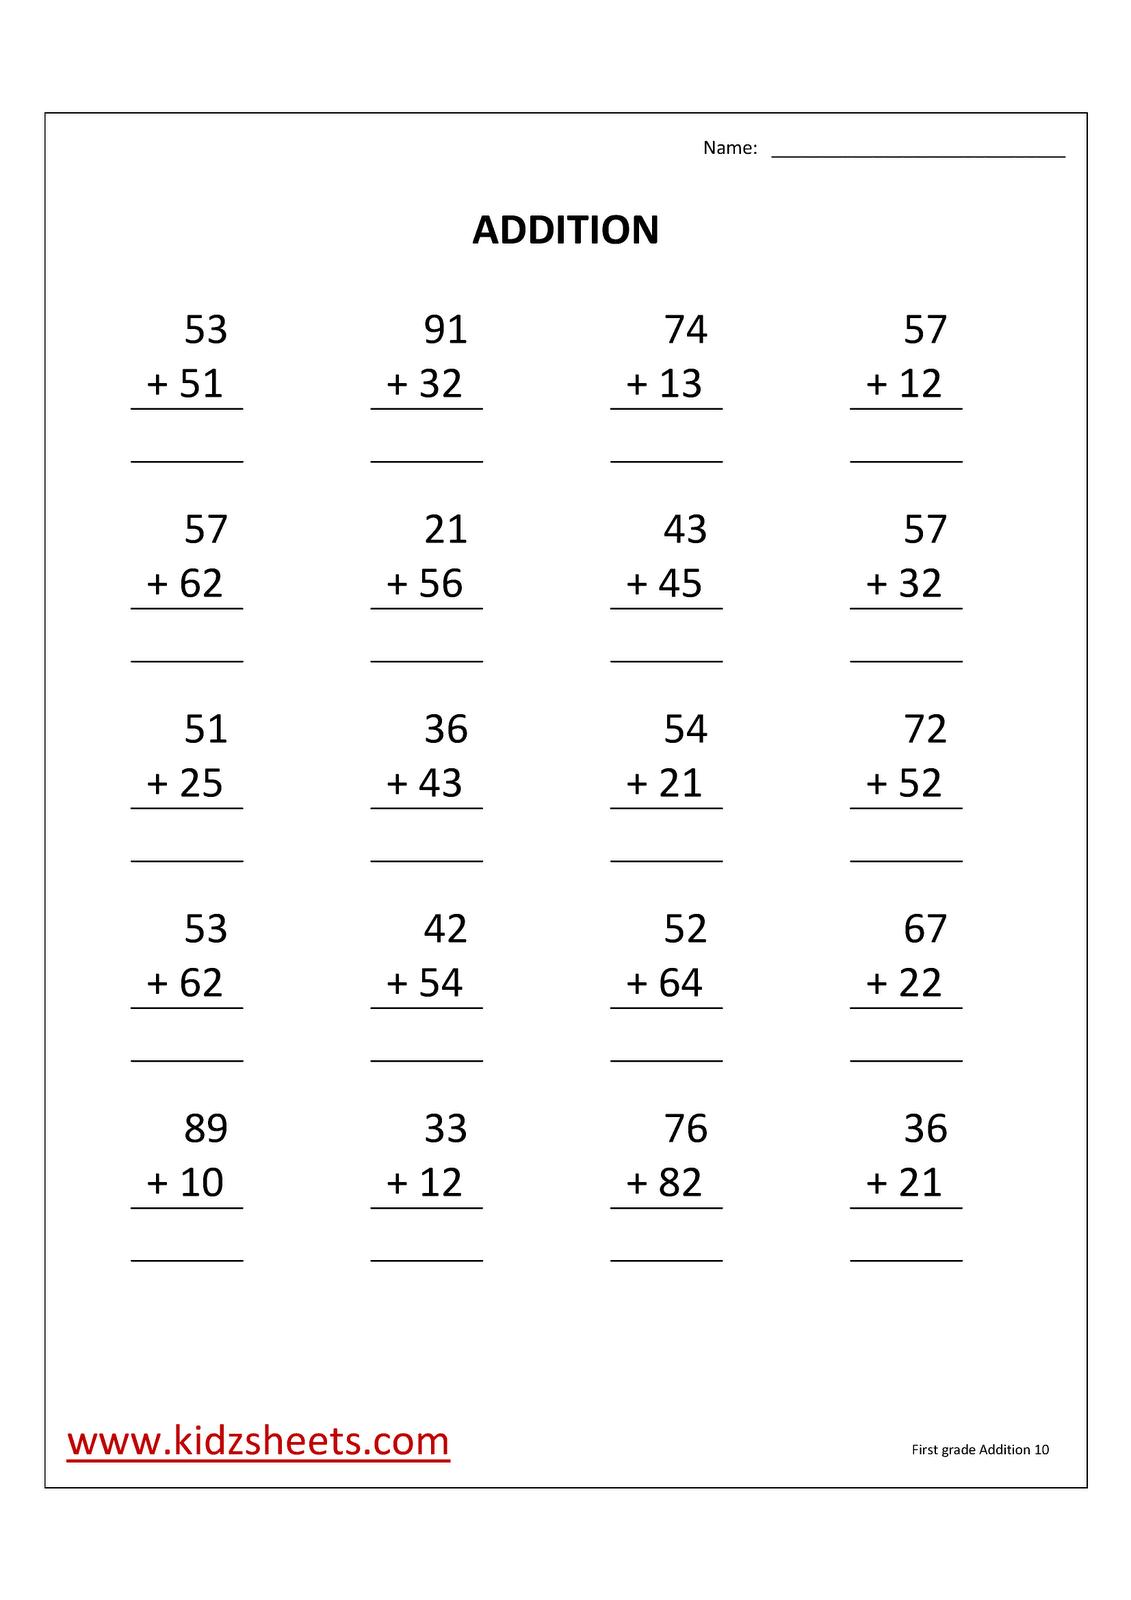 Kidz Worksheets First Grade Addition Worksheet10